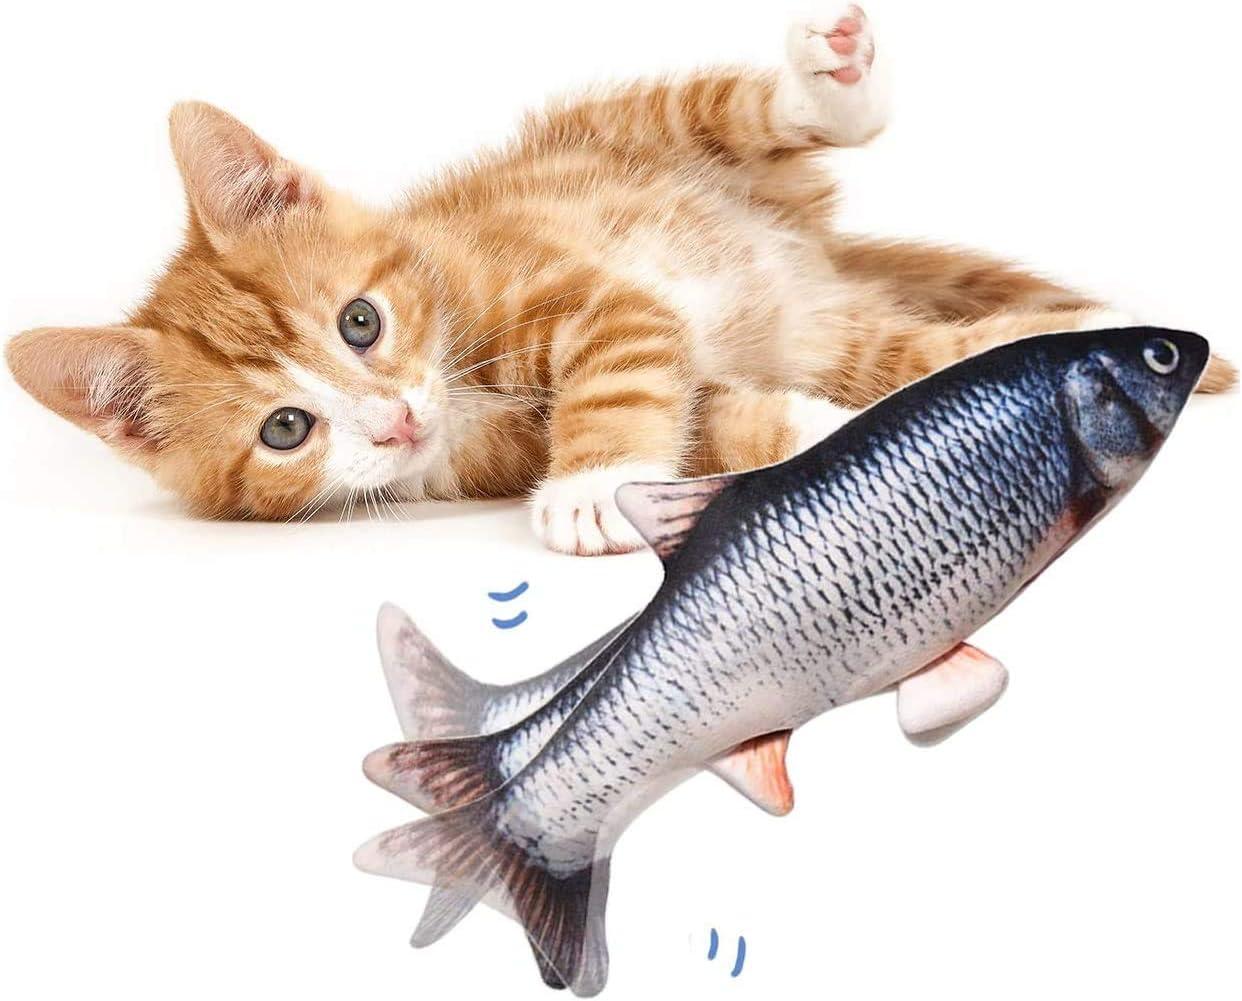 Kittens Fun Colorful Fish Set of 4 Catnip Ravioli Pillow Toys Cats